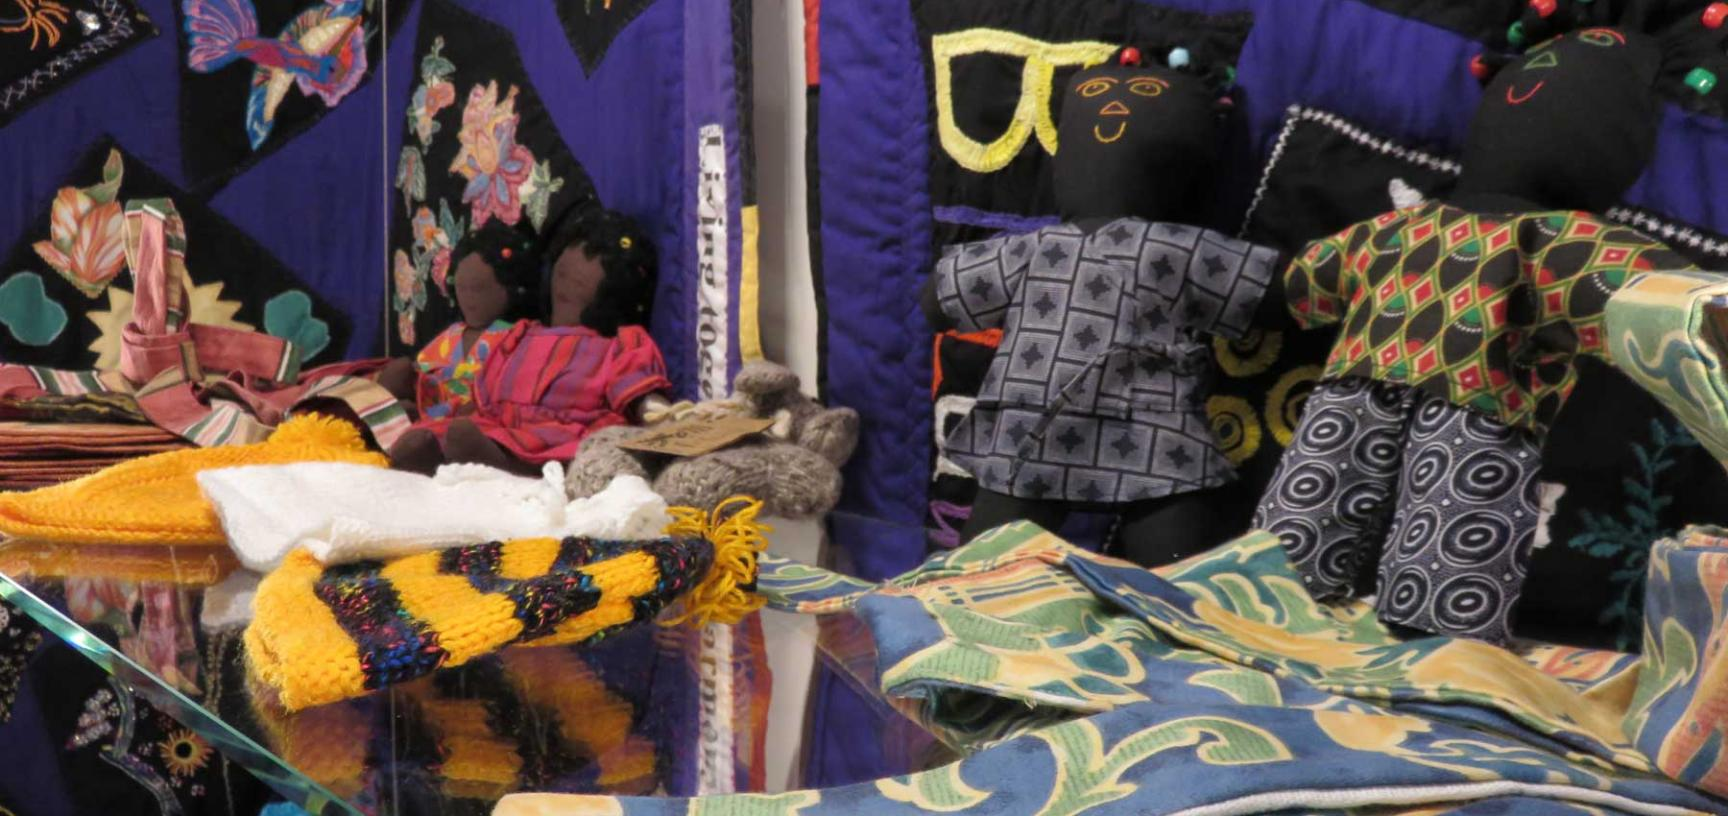 bk luwo display dolls